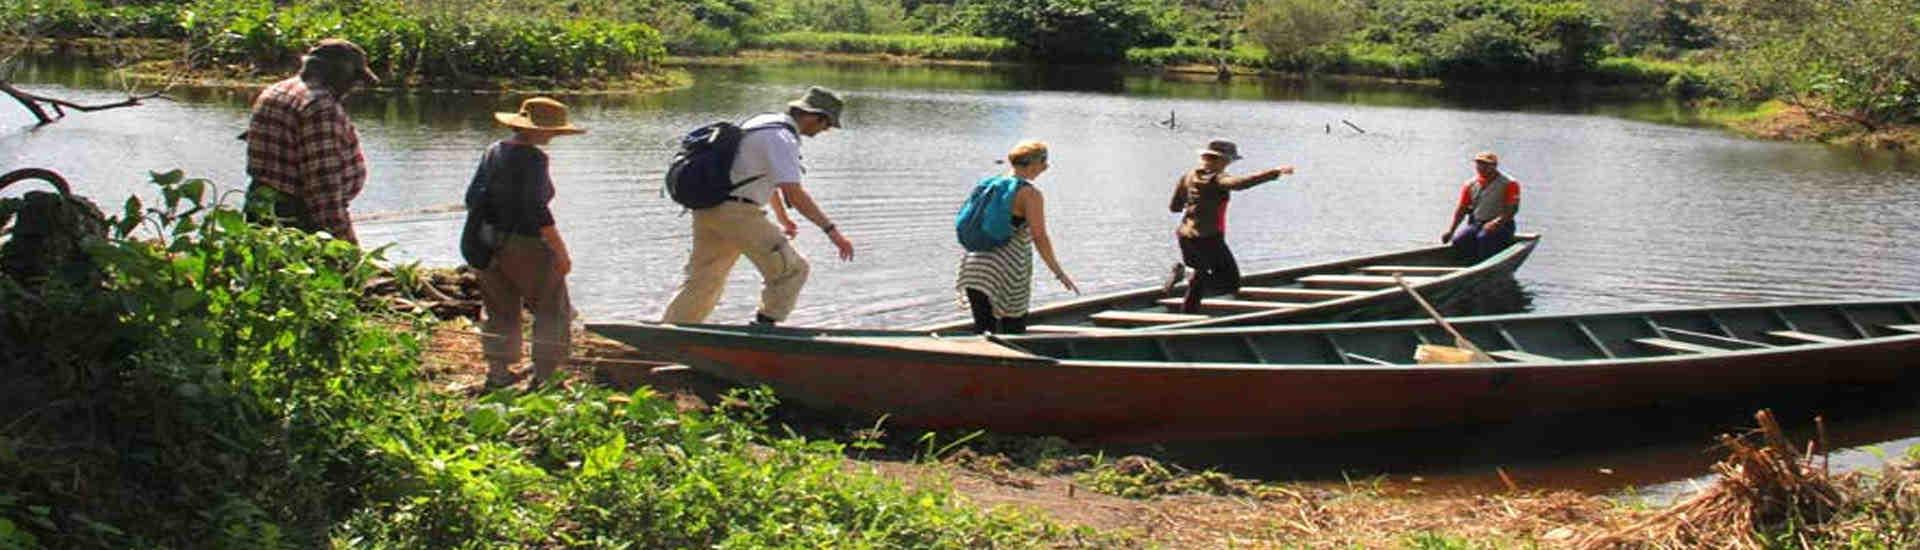 ecoamazonia apuvictor toursperumachupicchu